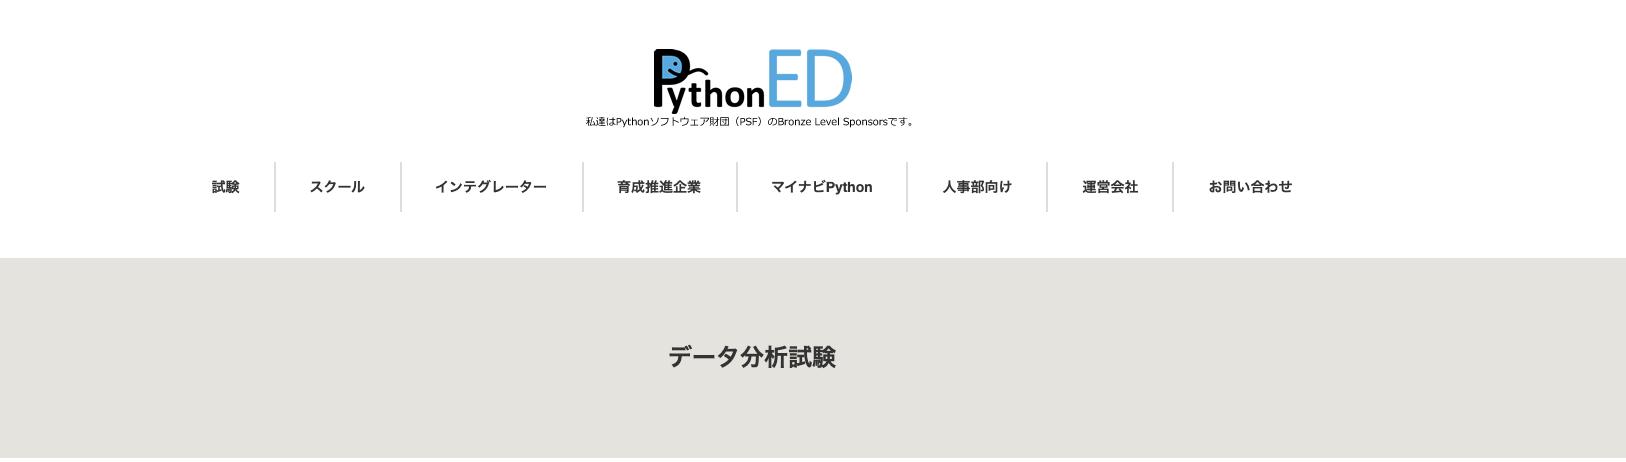 Python 3 エンジニア認定基礎試験・データ分析試験